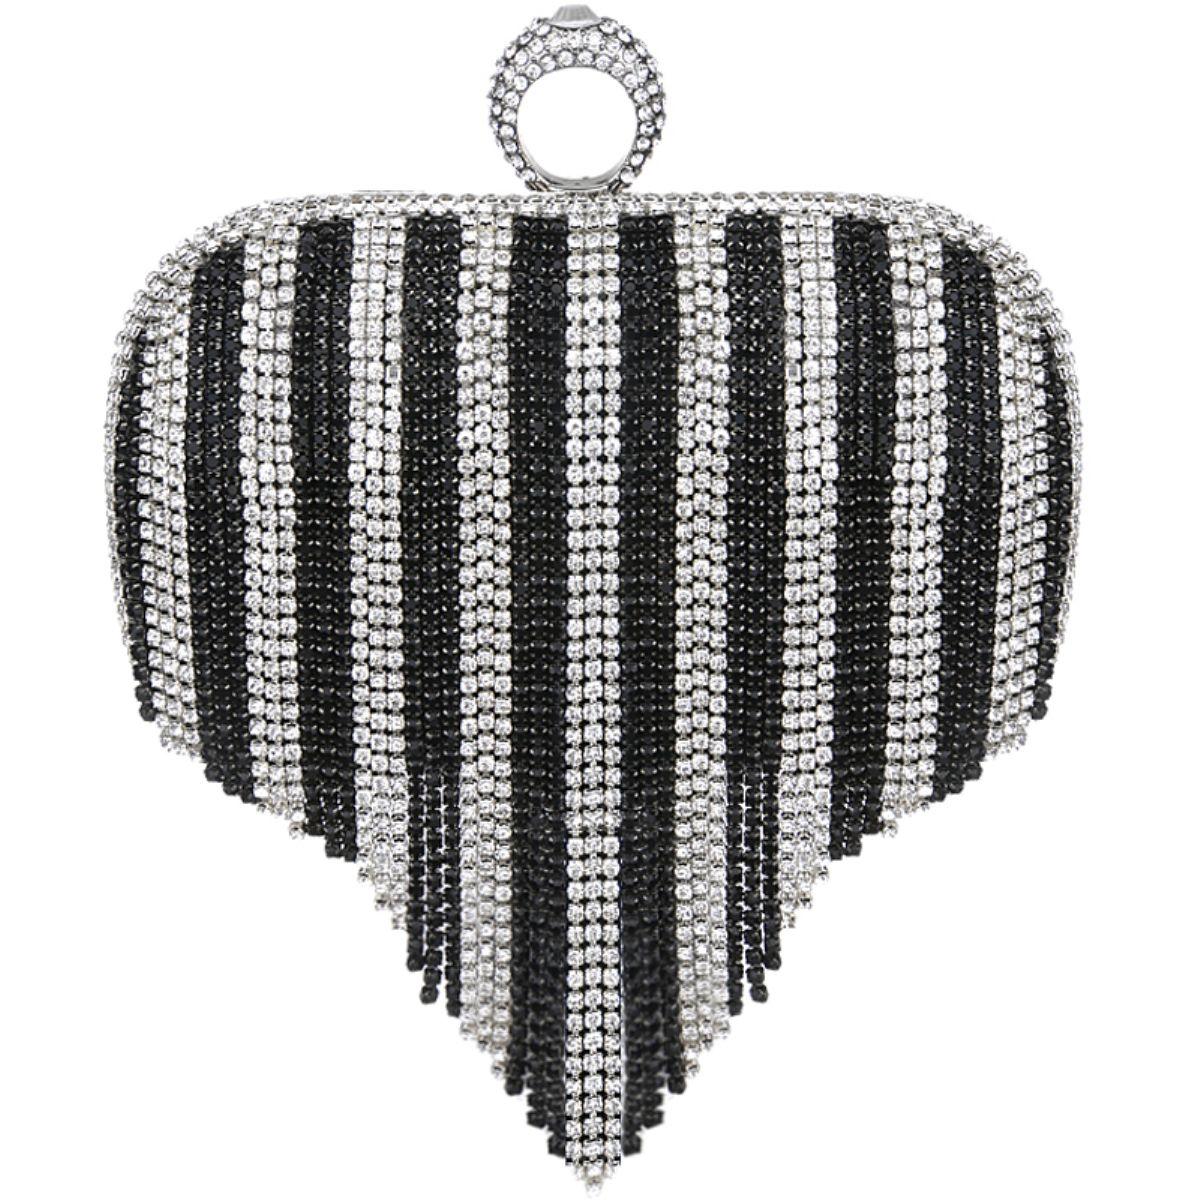 New Fashion Tassel Rhinestone Diamond Finger Ring Bling Women Evening Bag Bridal Wedding Handbag Clutch Bag Wallet Purse For Wedding Dinner